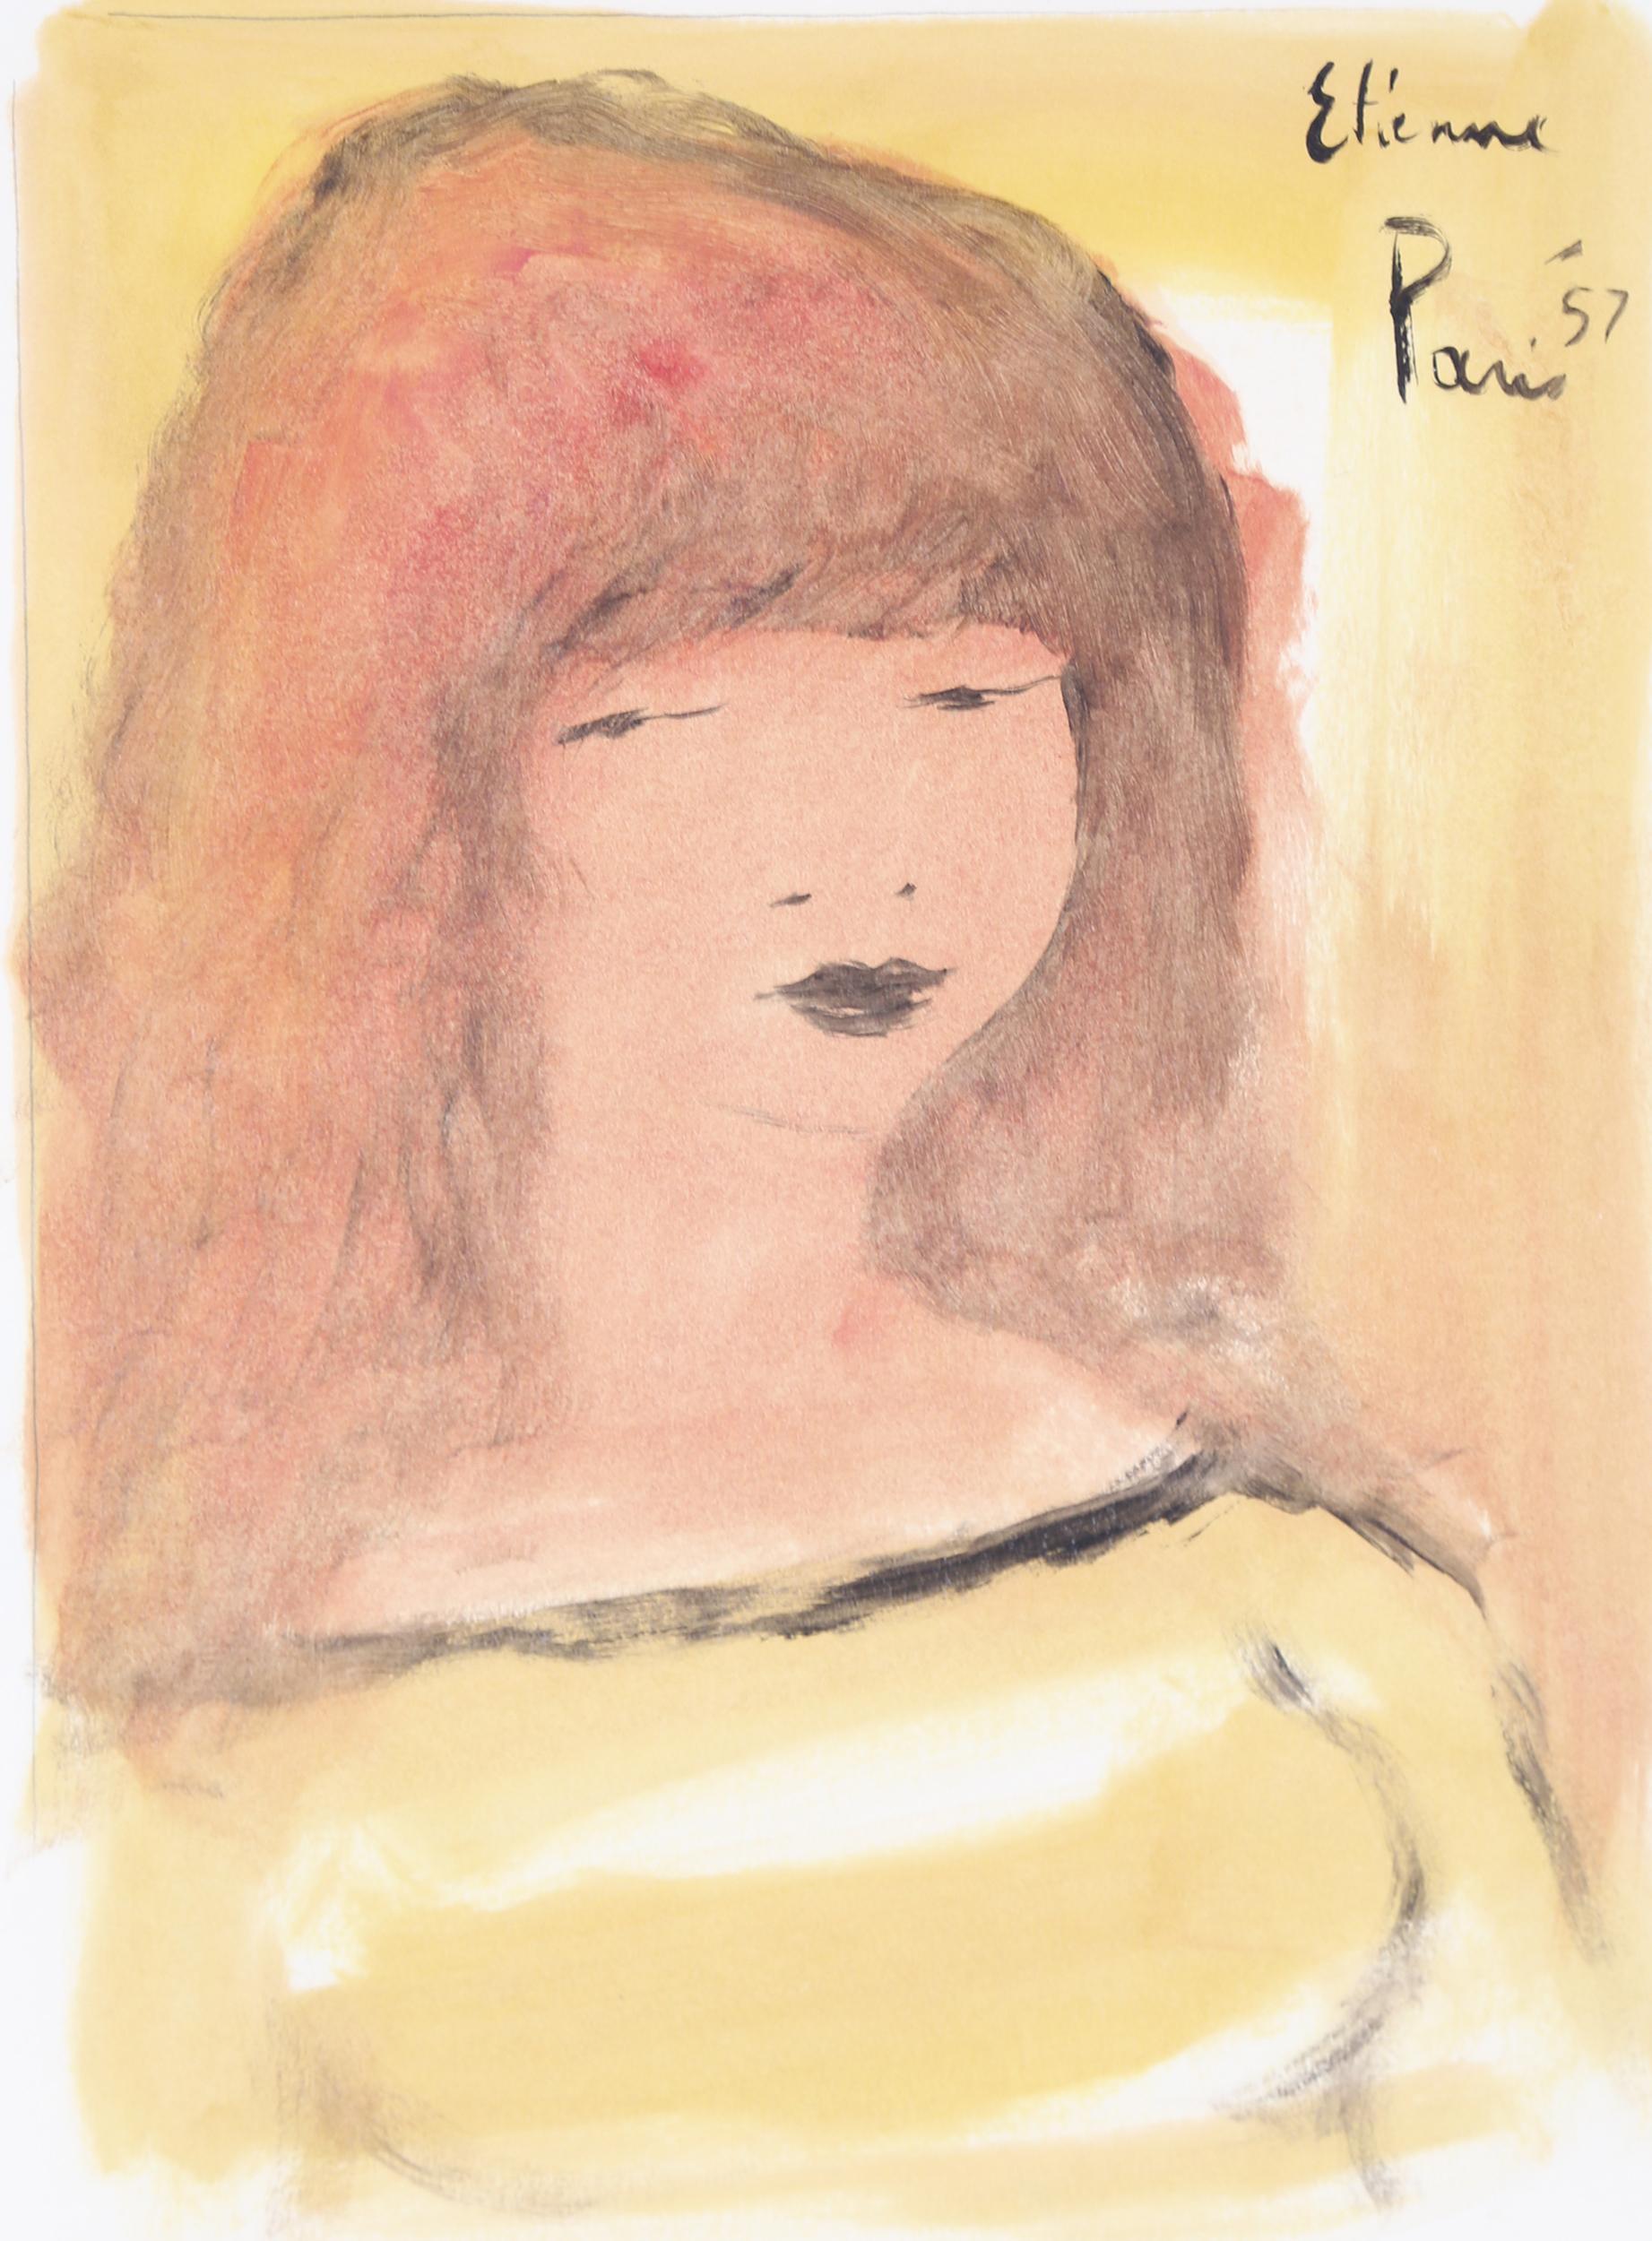 Roger Etienne, Portrait of Girl 2, Gouache Painting